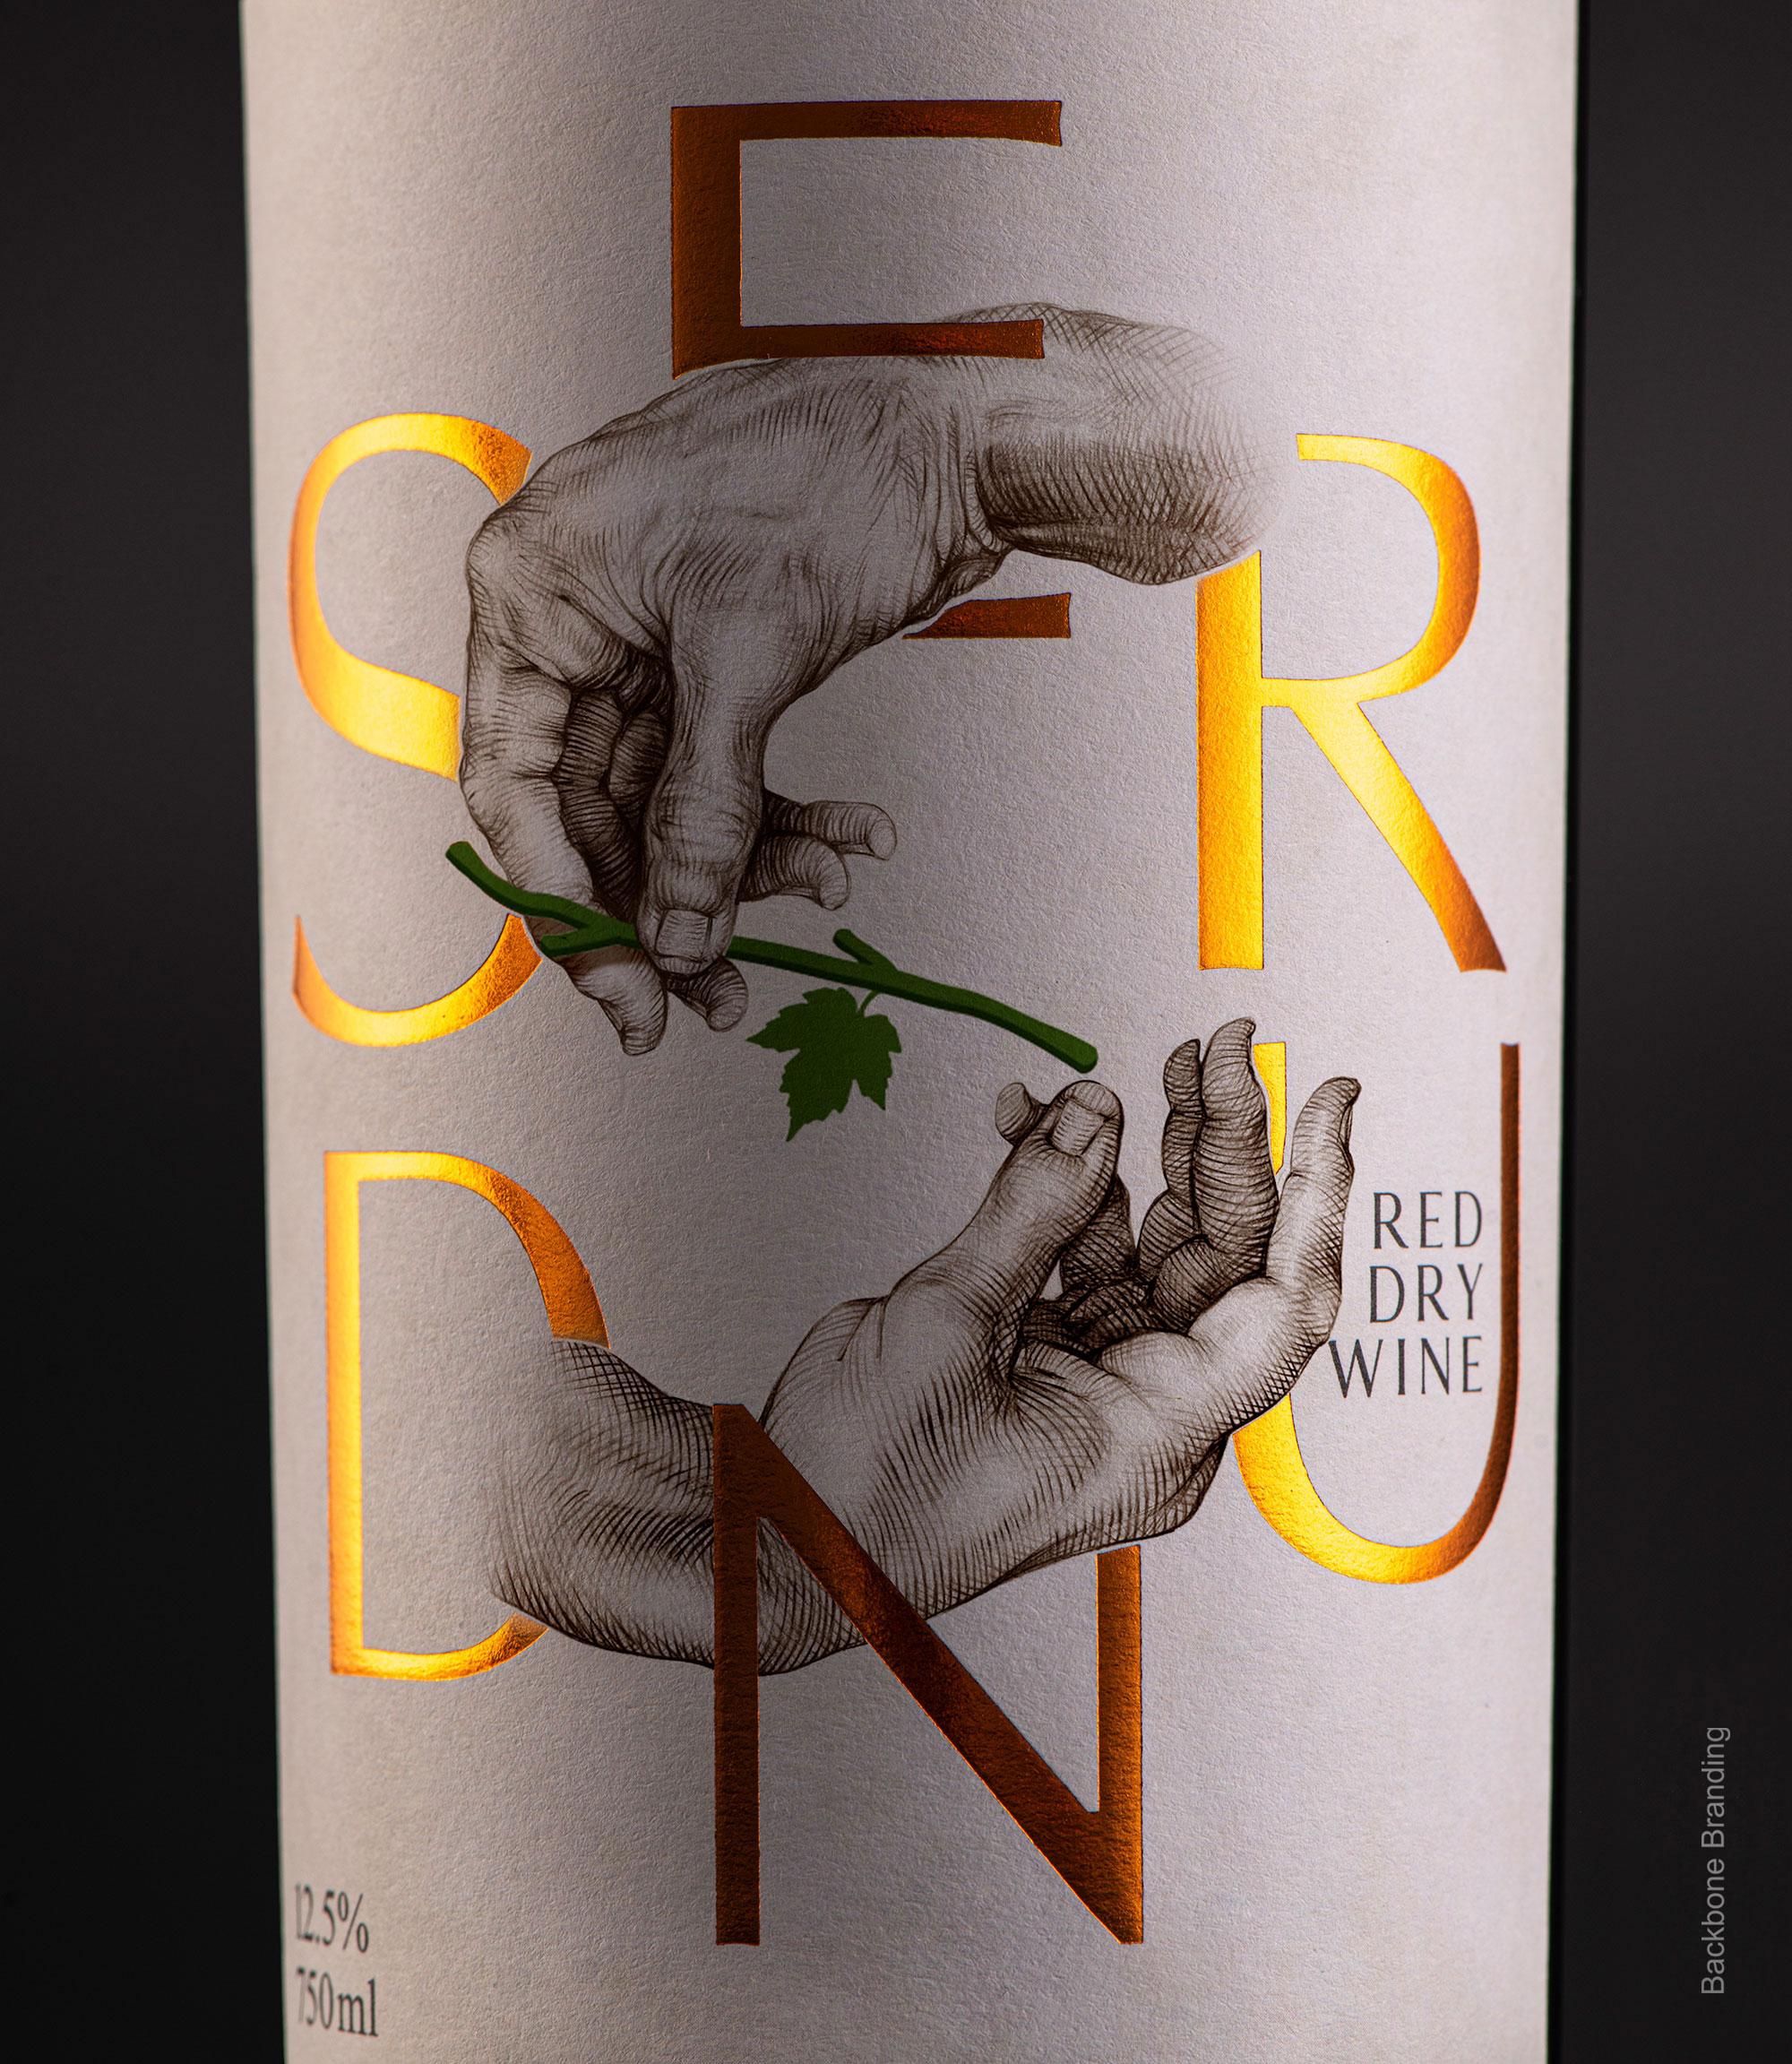 Brand and Packaging Design for Serund Wine by Backbone Branding